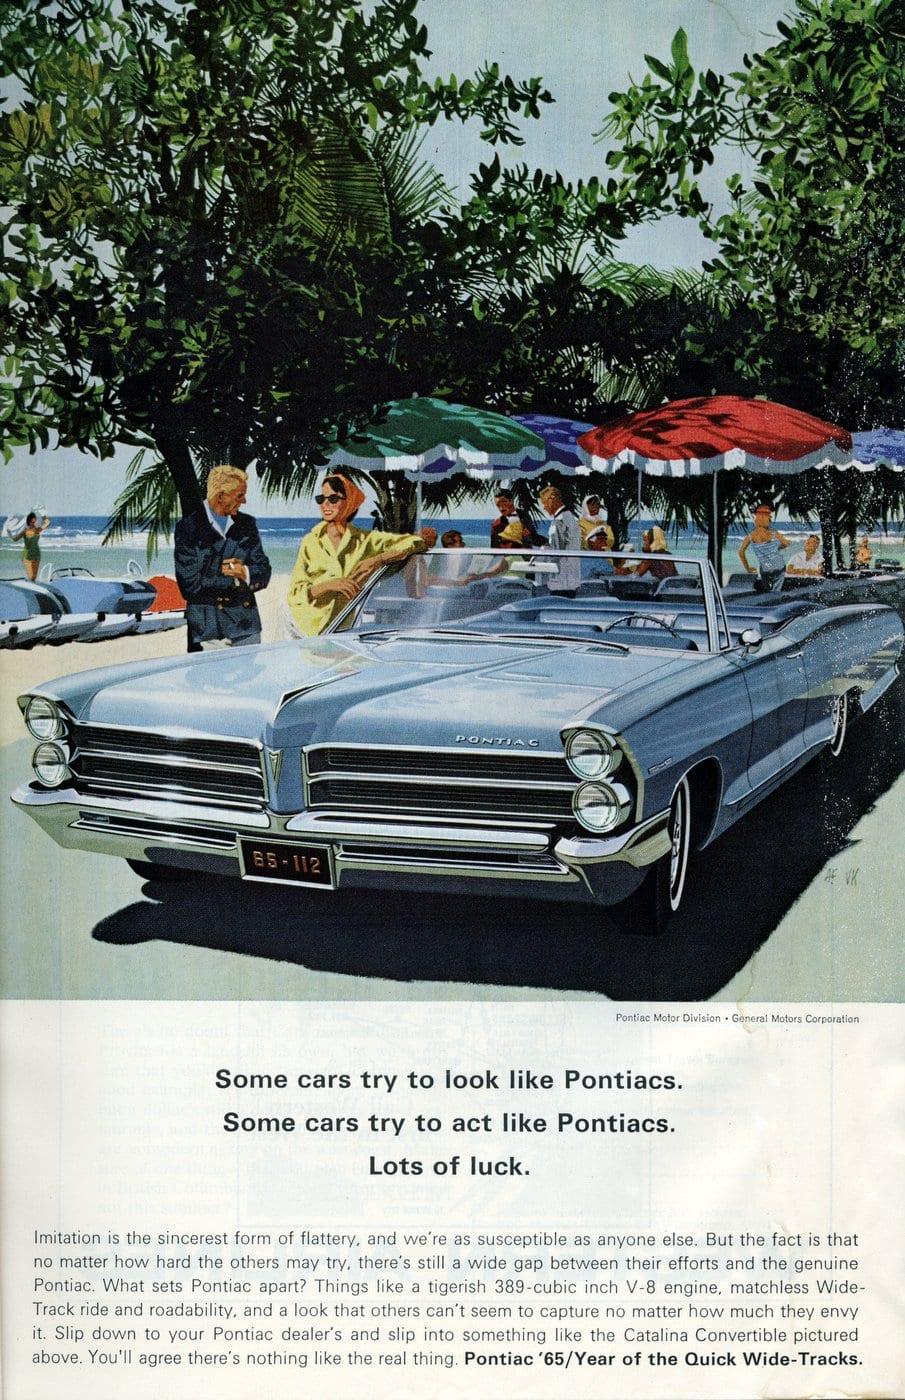 The 1965 Catalina Convertible